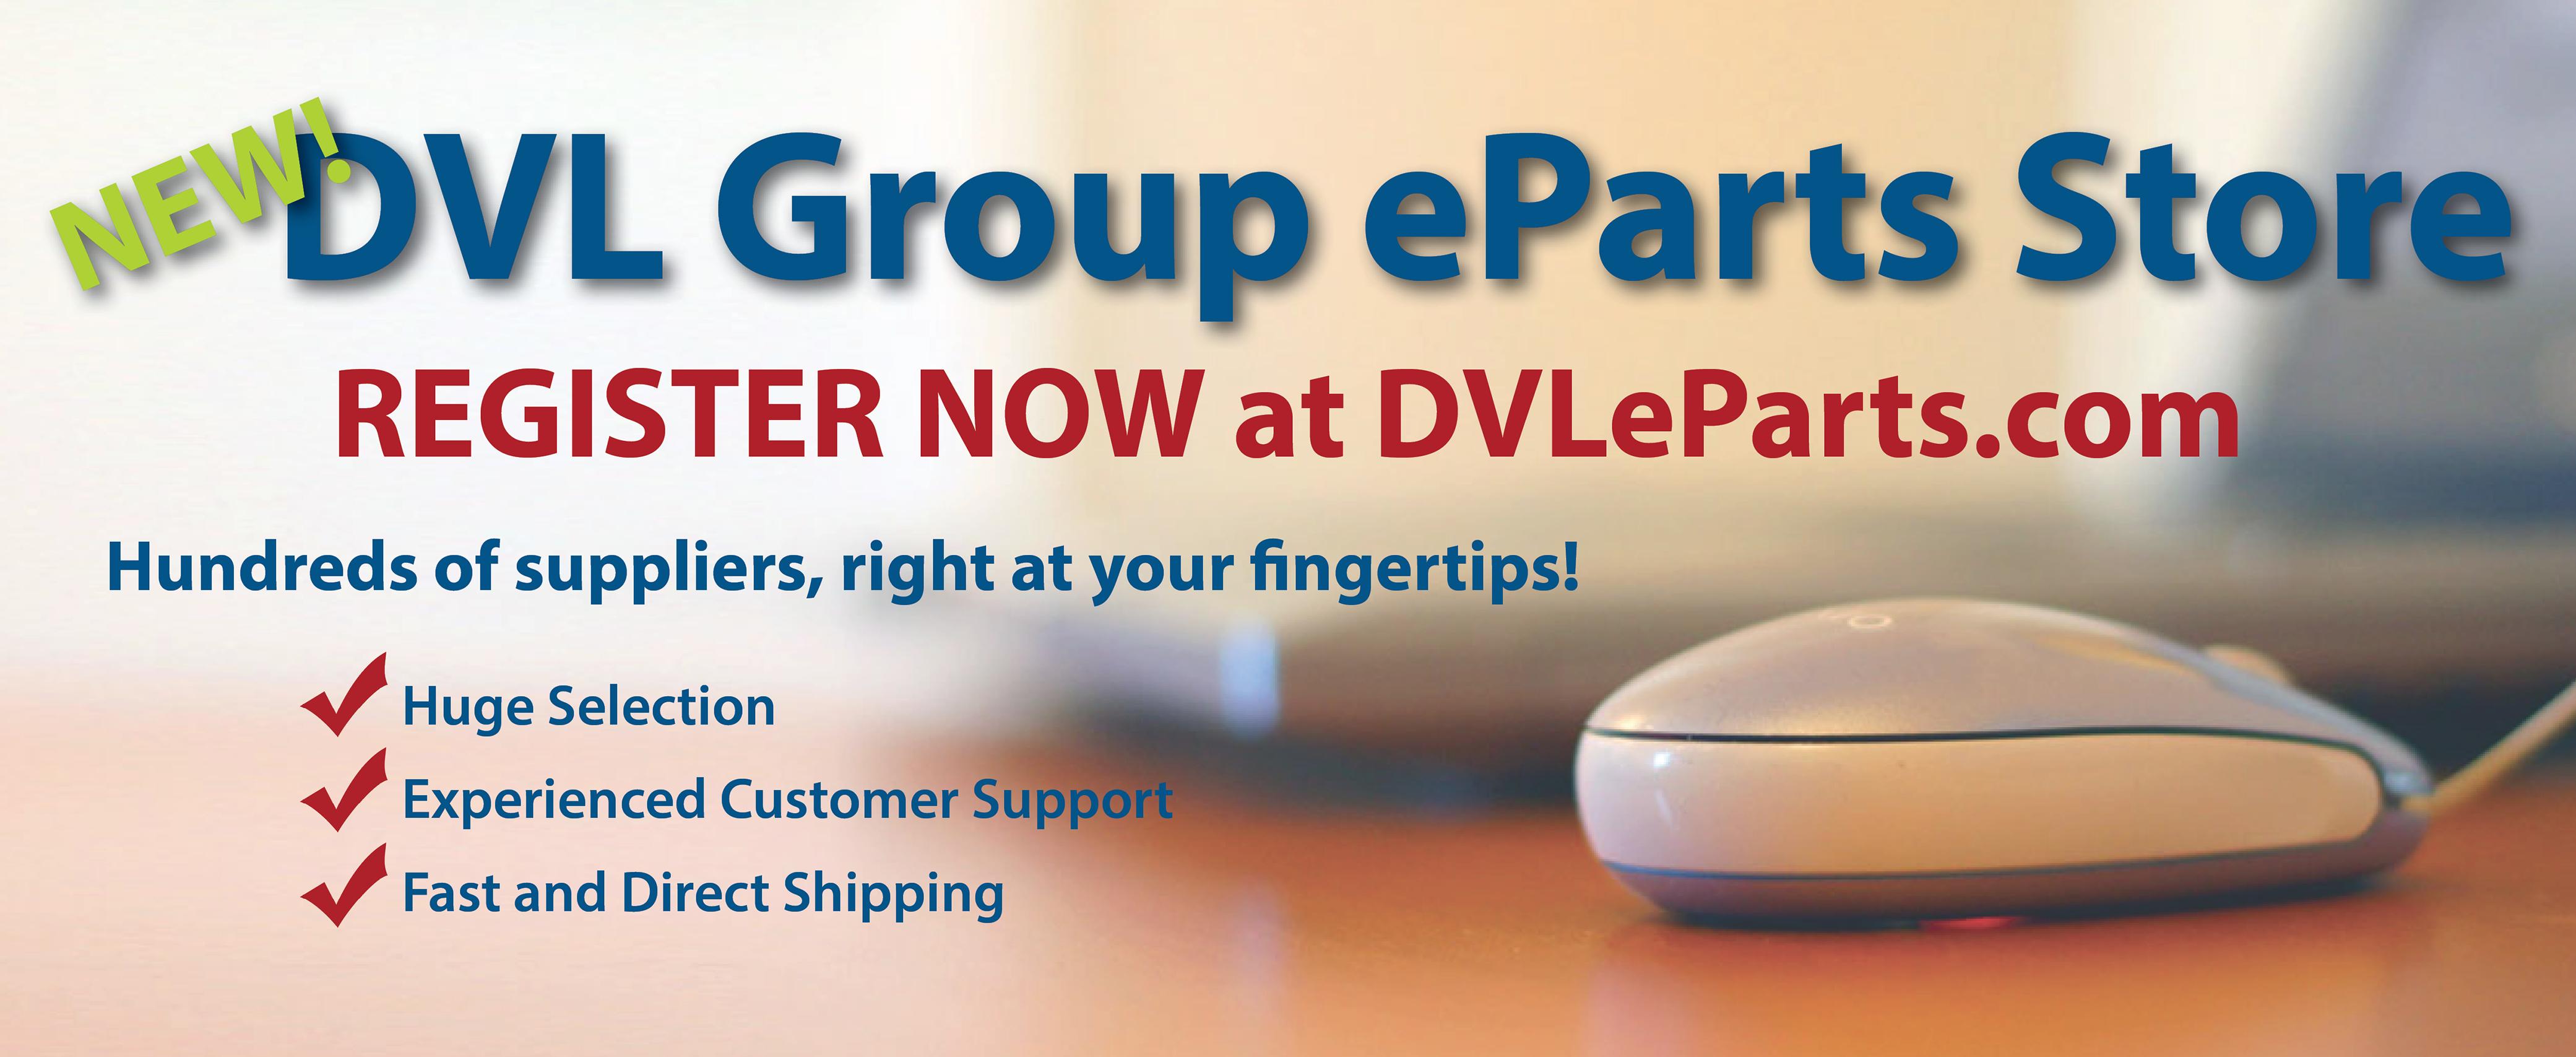 DVL Group eParts Store